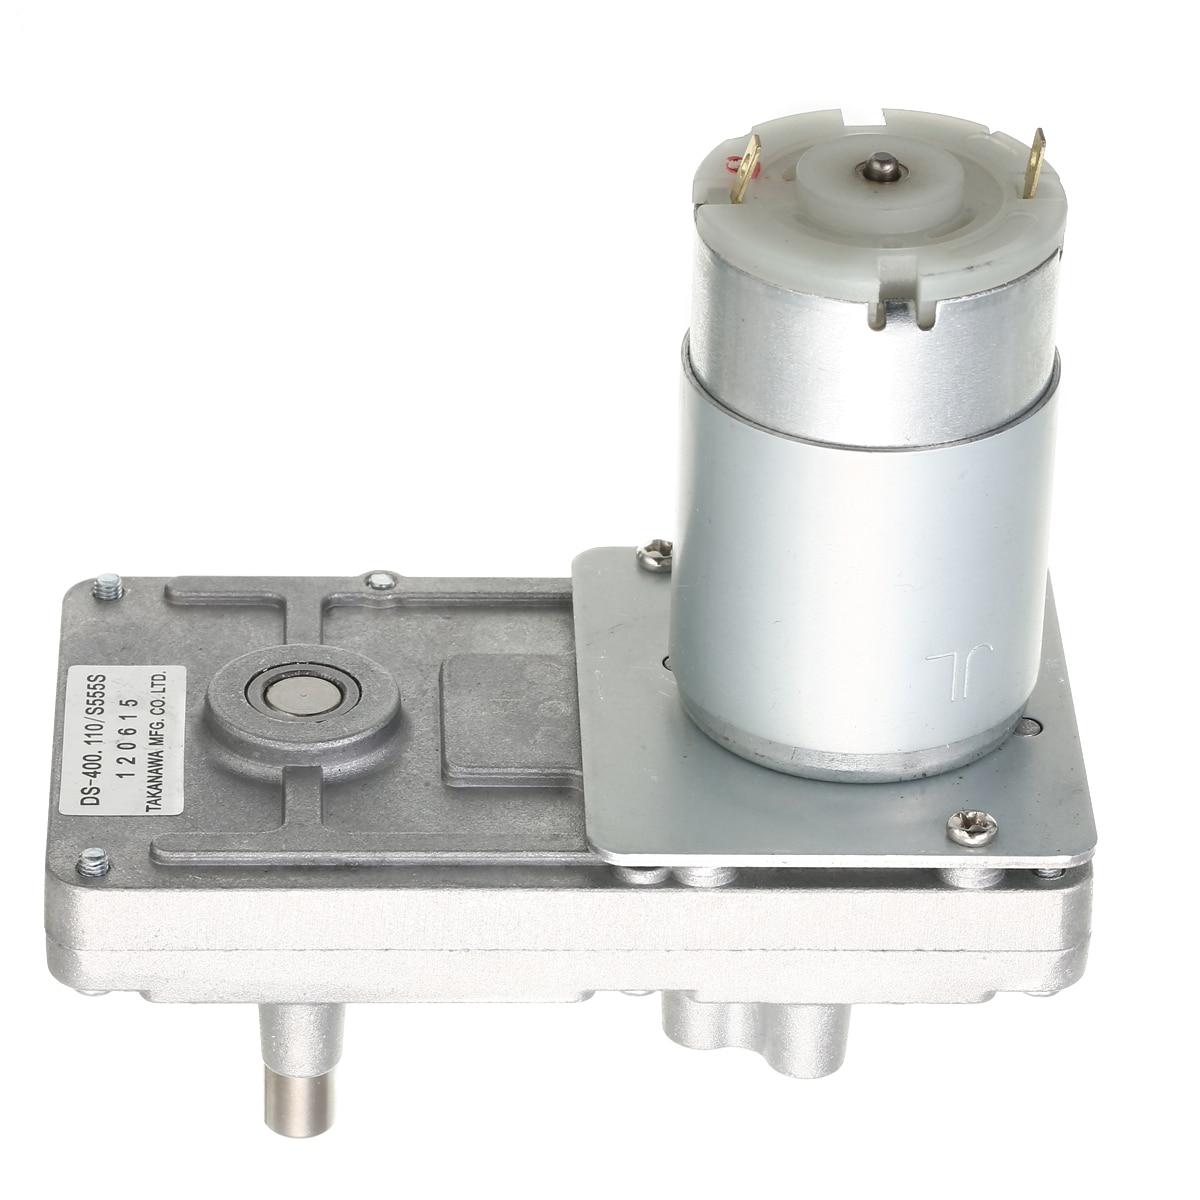 DC Motor RS-555 Takanawa 555 Getriebe Motor Metall 12V-24V DC Reduktion Getriebe Motor Hohe Drehmoment Niedrigen lärm für Elektrische vorhänge öfen